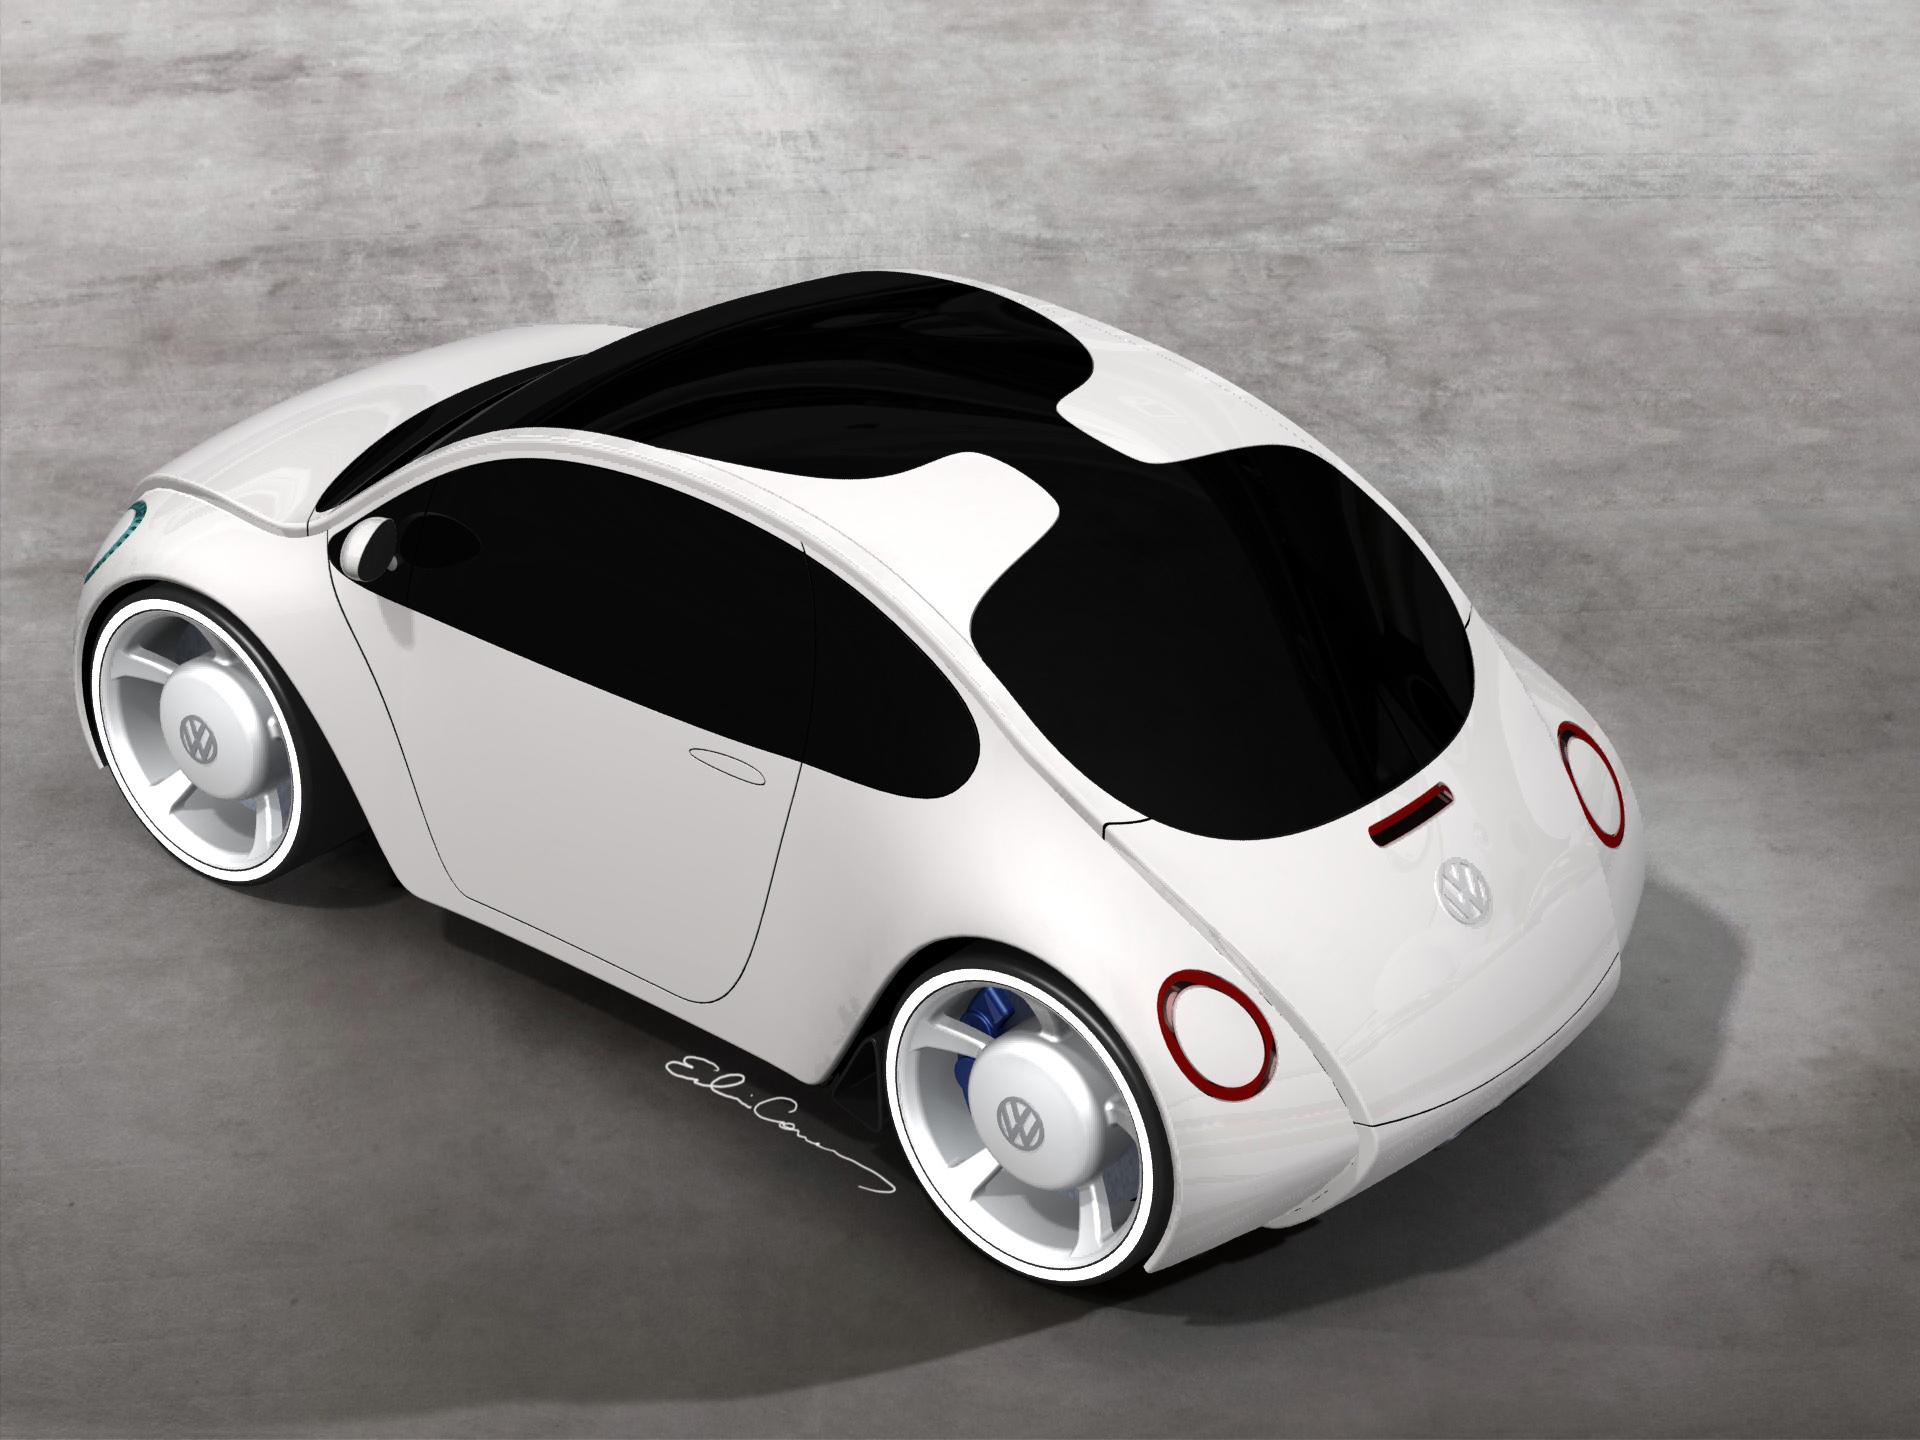 VW Beetle Concept by Edwin Conan at Coroflot.com